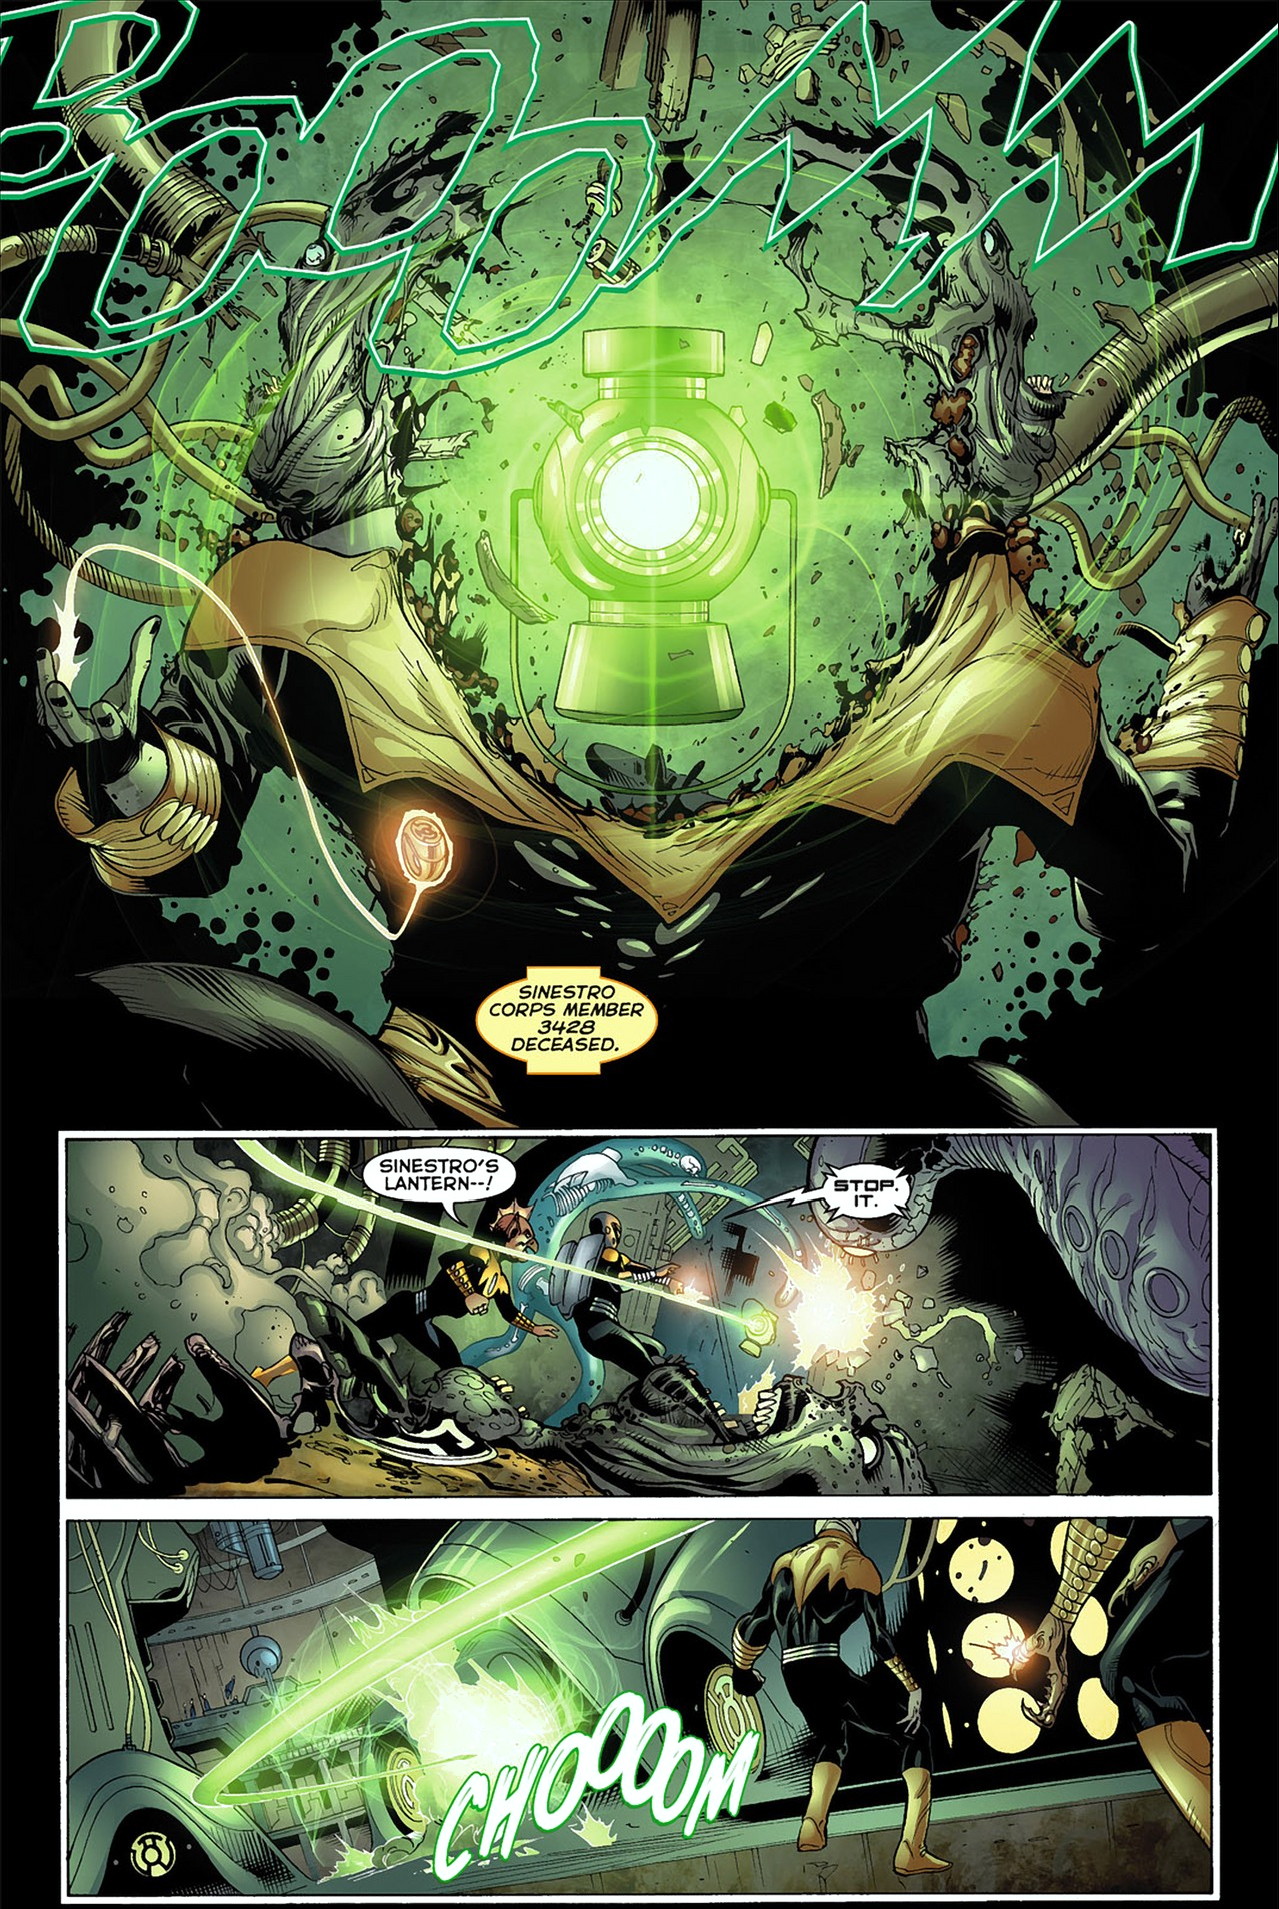 Sinestro's Green Lantern Power Battery Can Kill